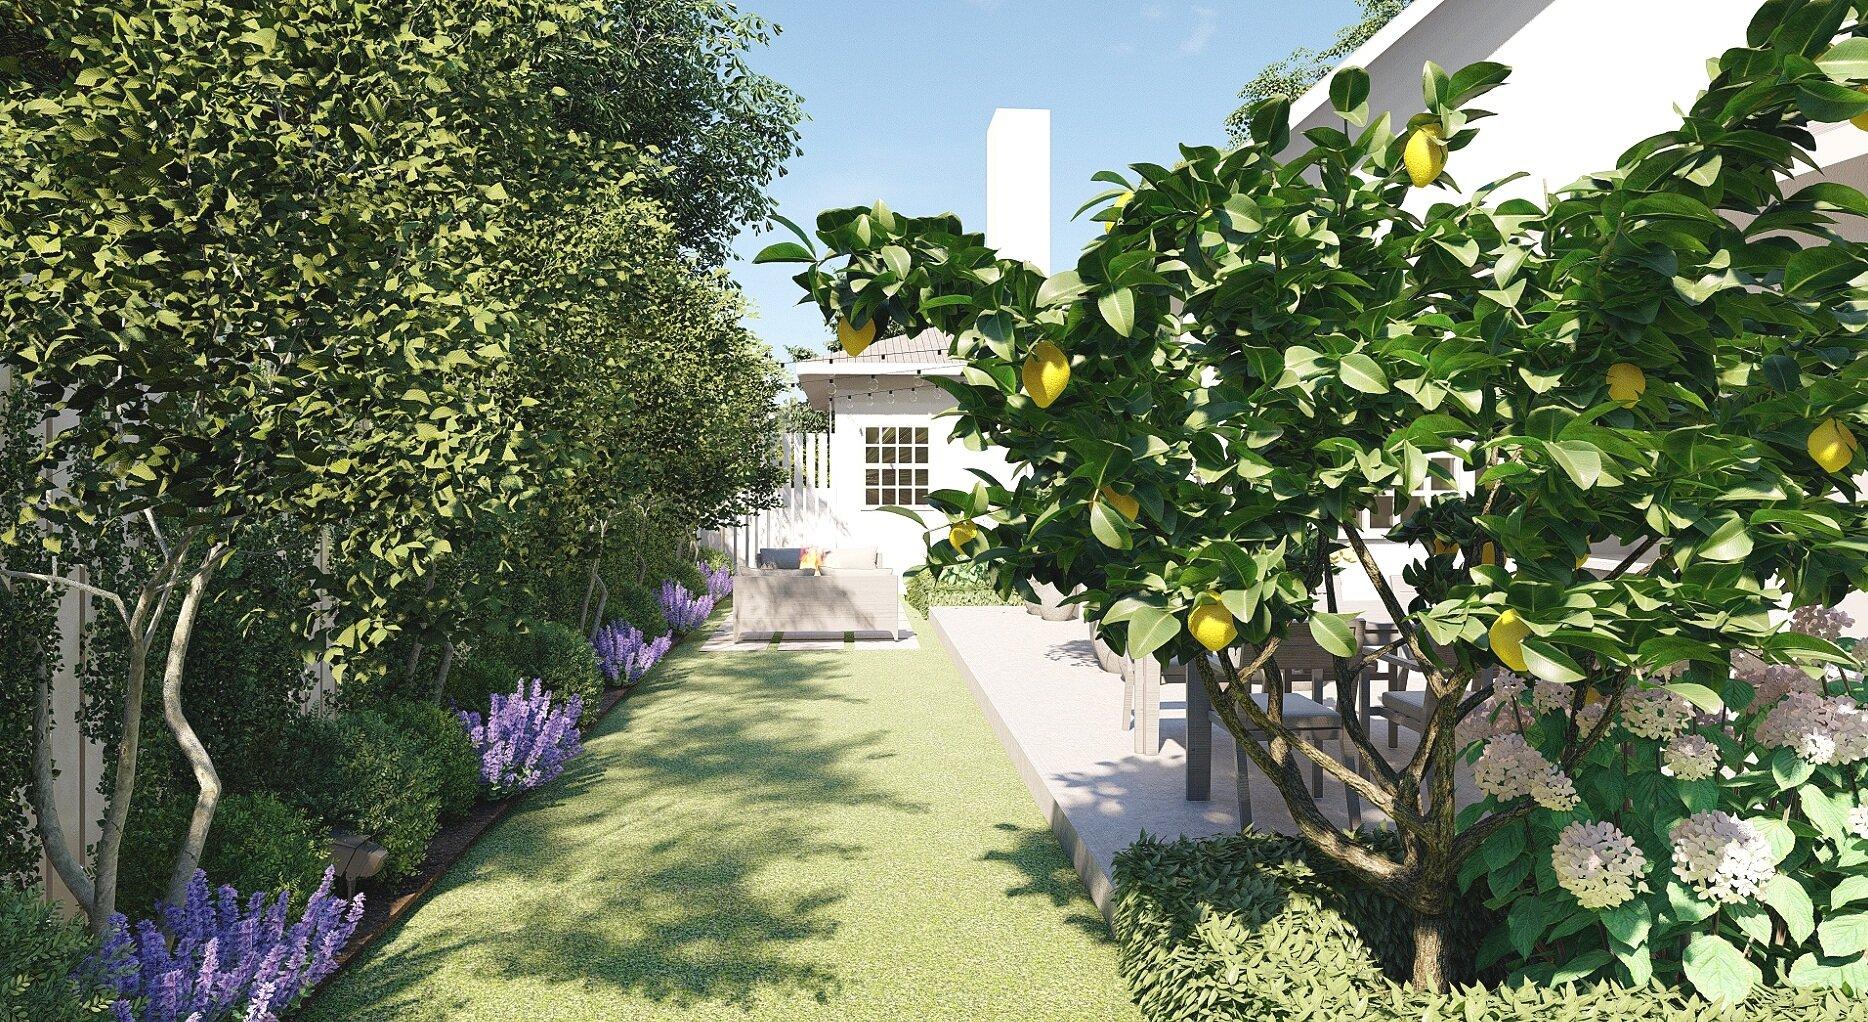 Landscape Design Online: The Top 5 Benefits of Working ...